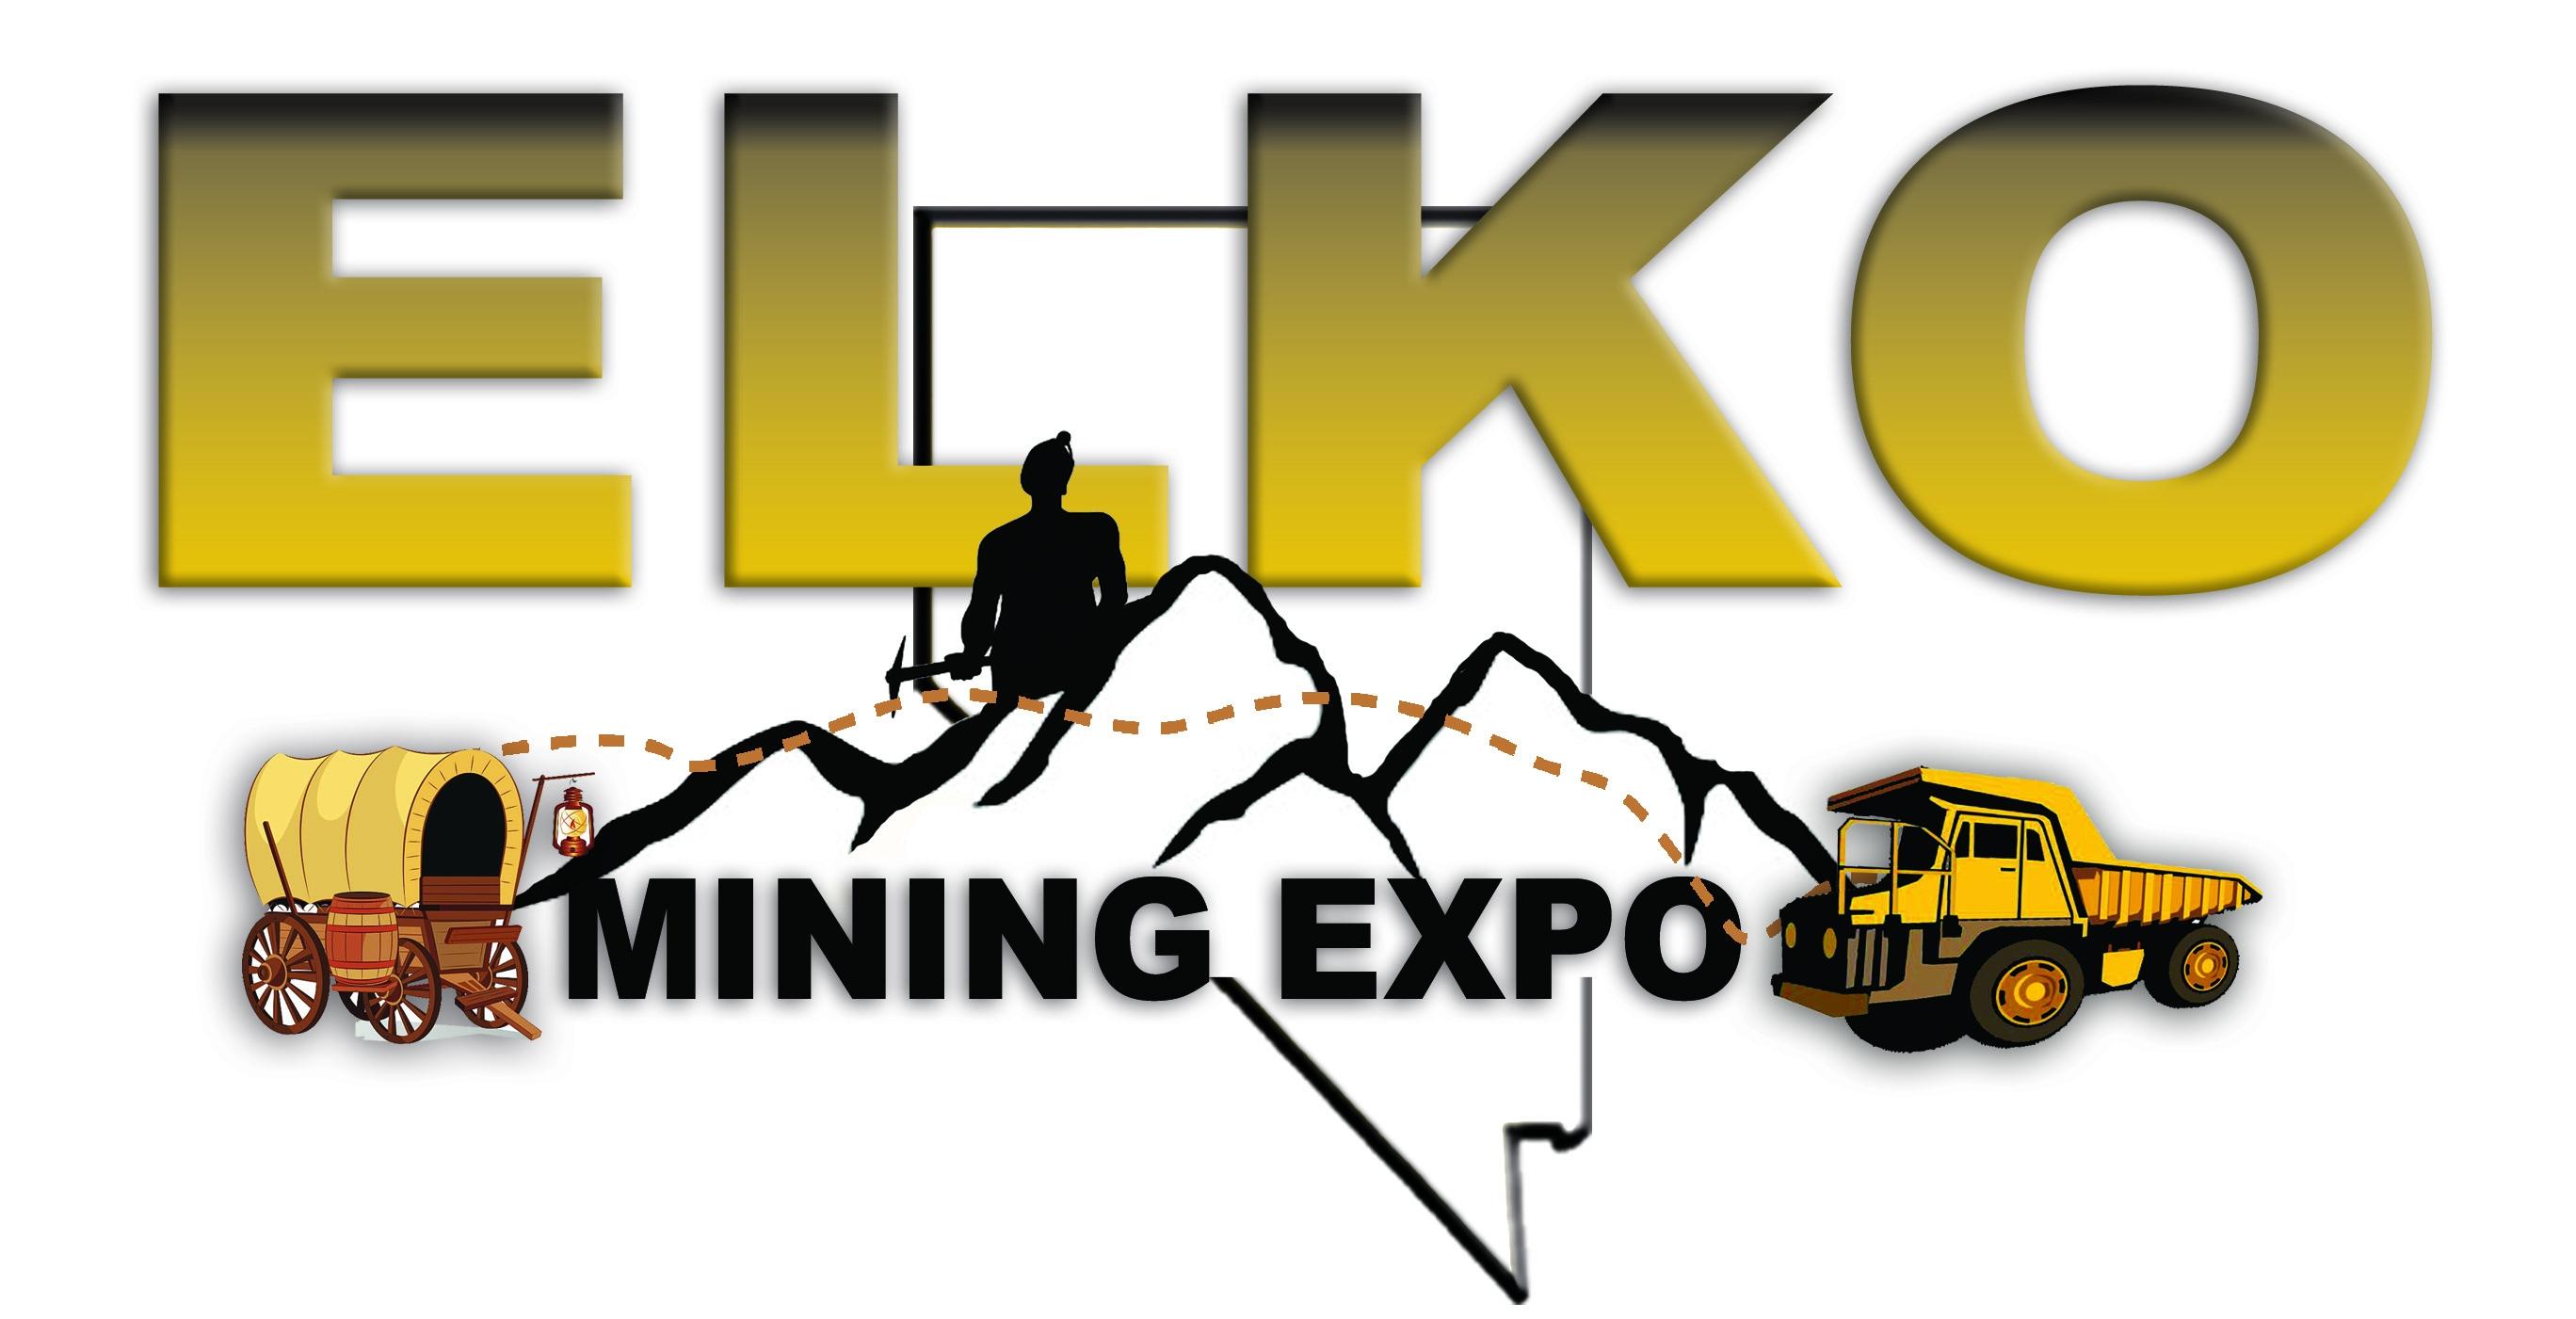 Elko Mining Expo 2021 (June 10-11, 2021) Elko, NV